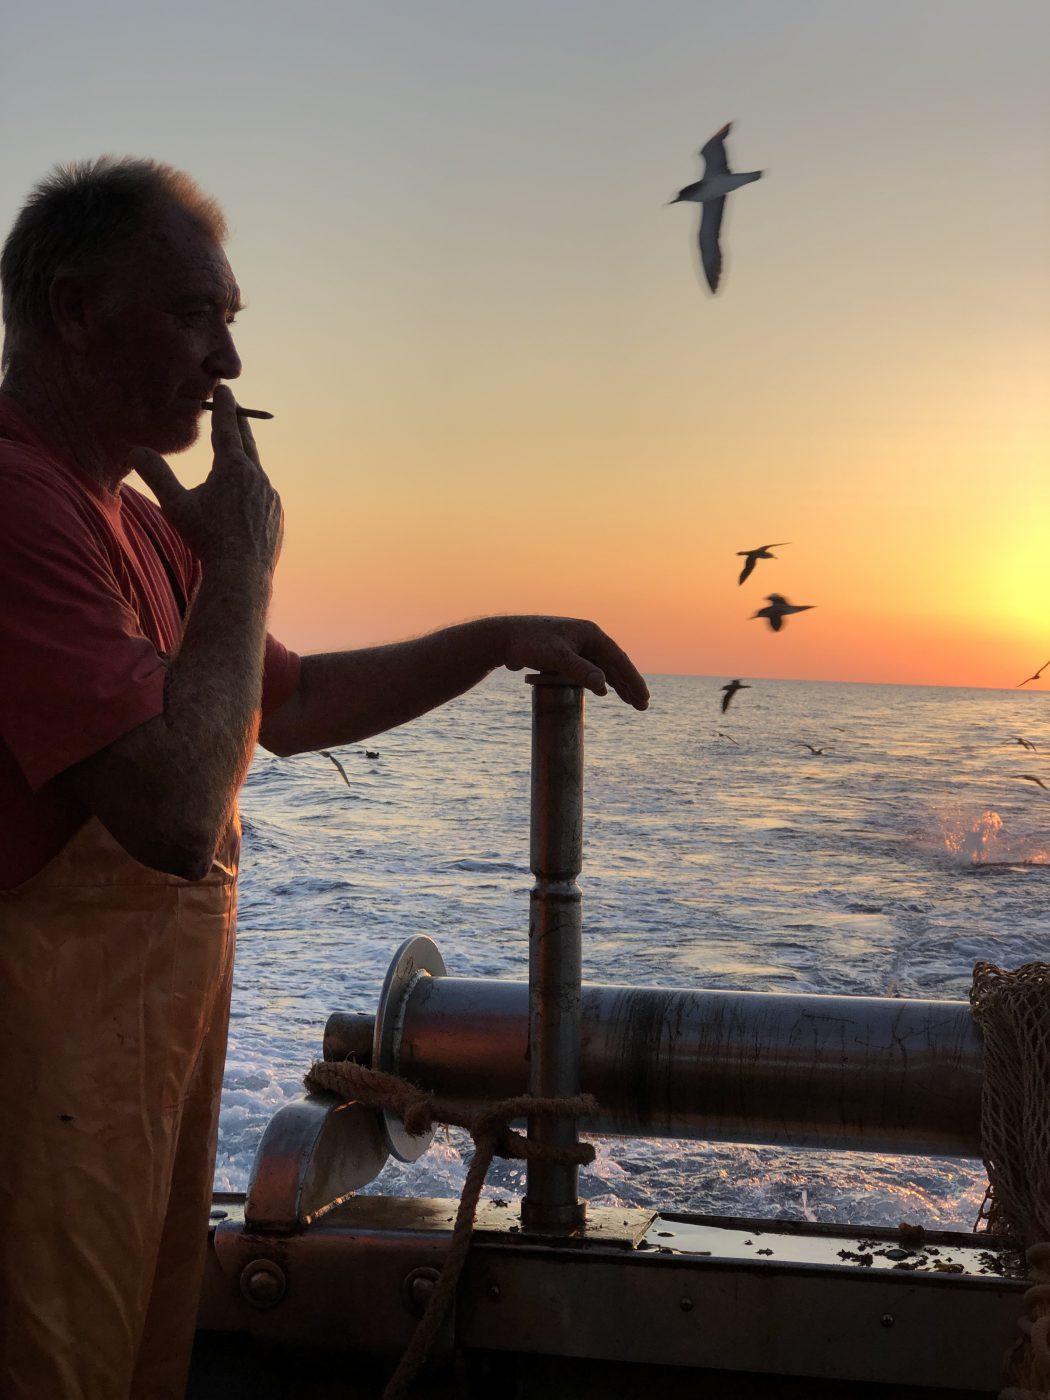 Favignana Island Sicilia - a fishing boat named Osprey